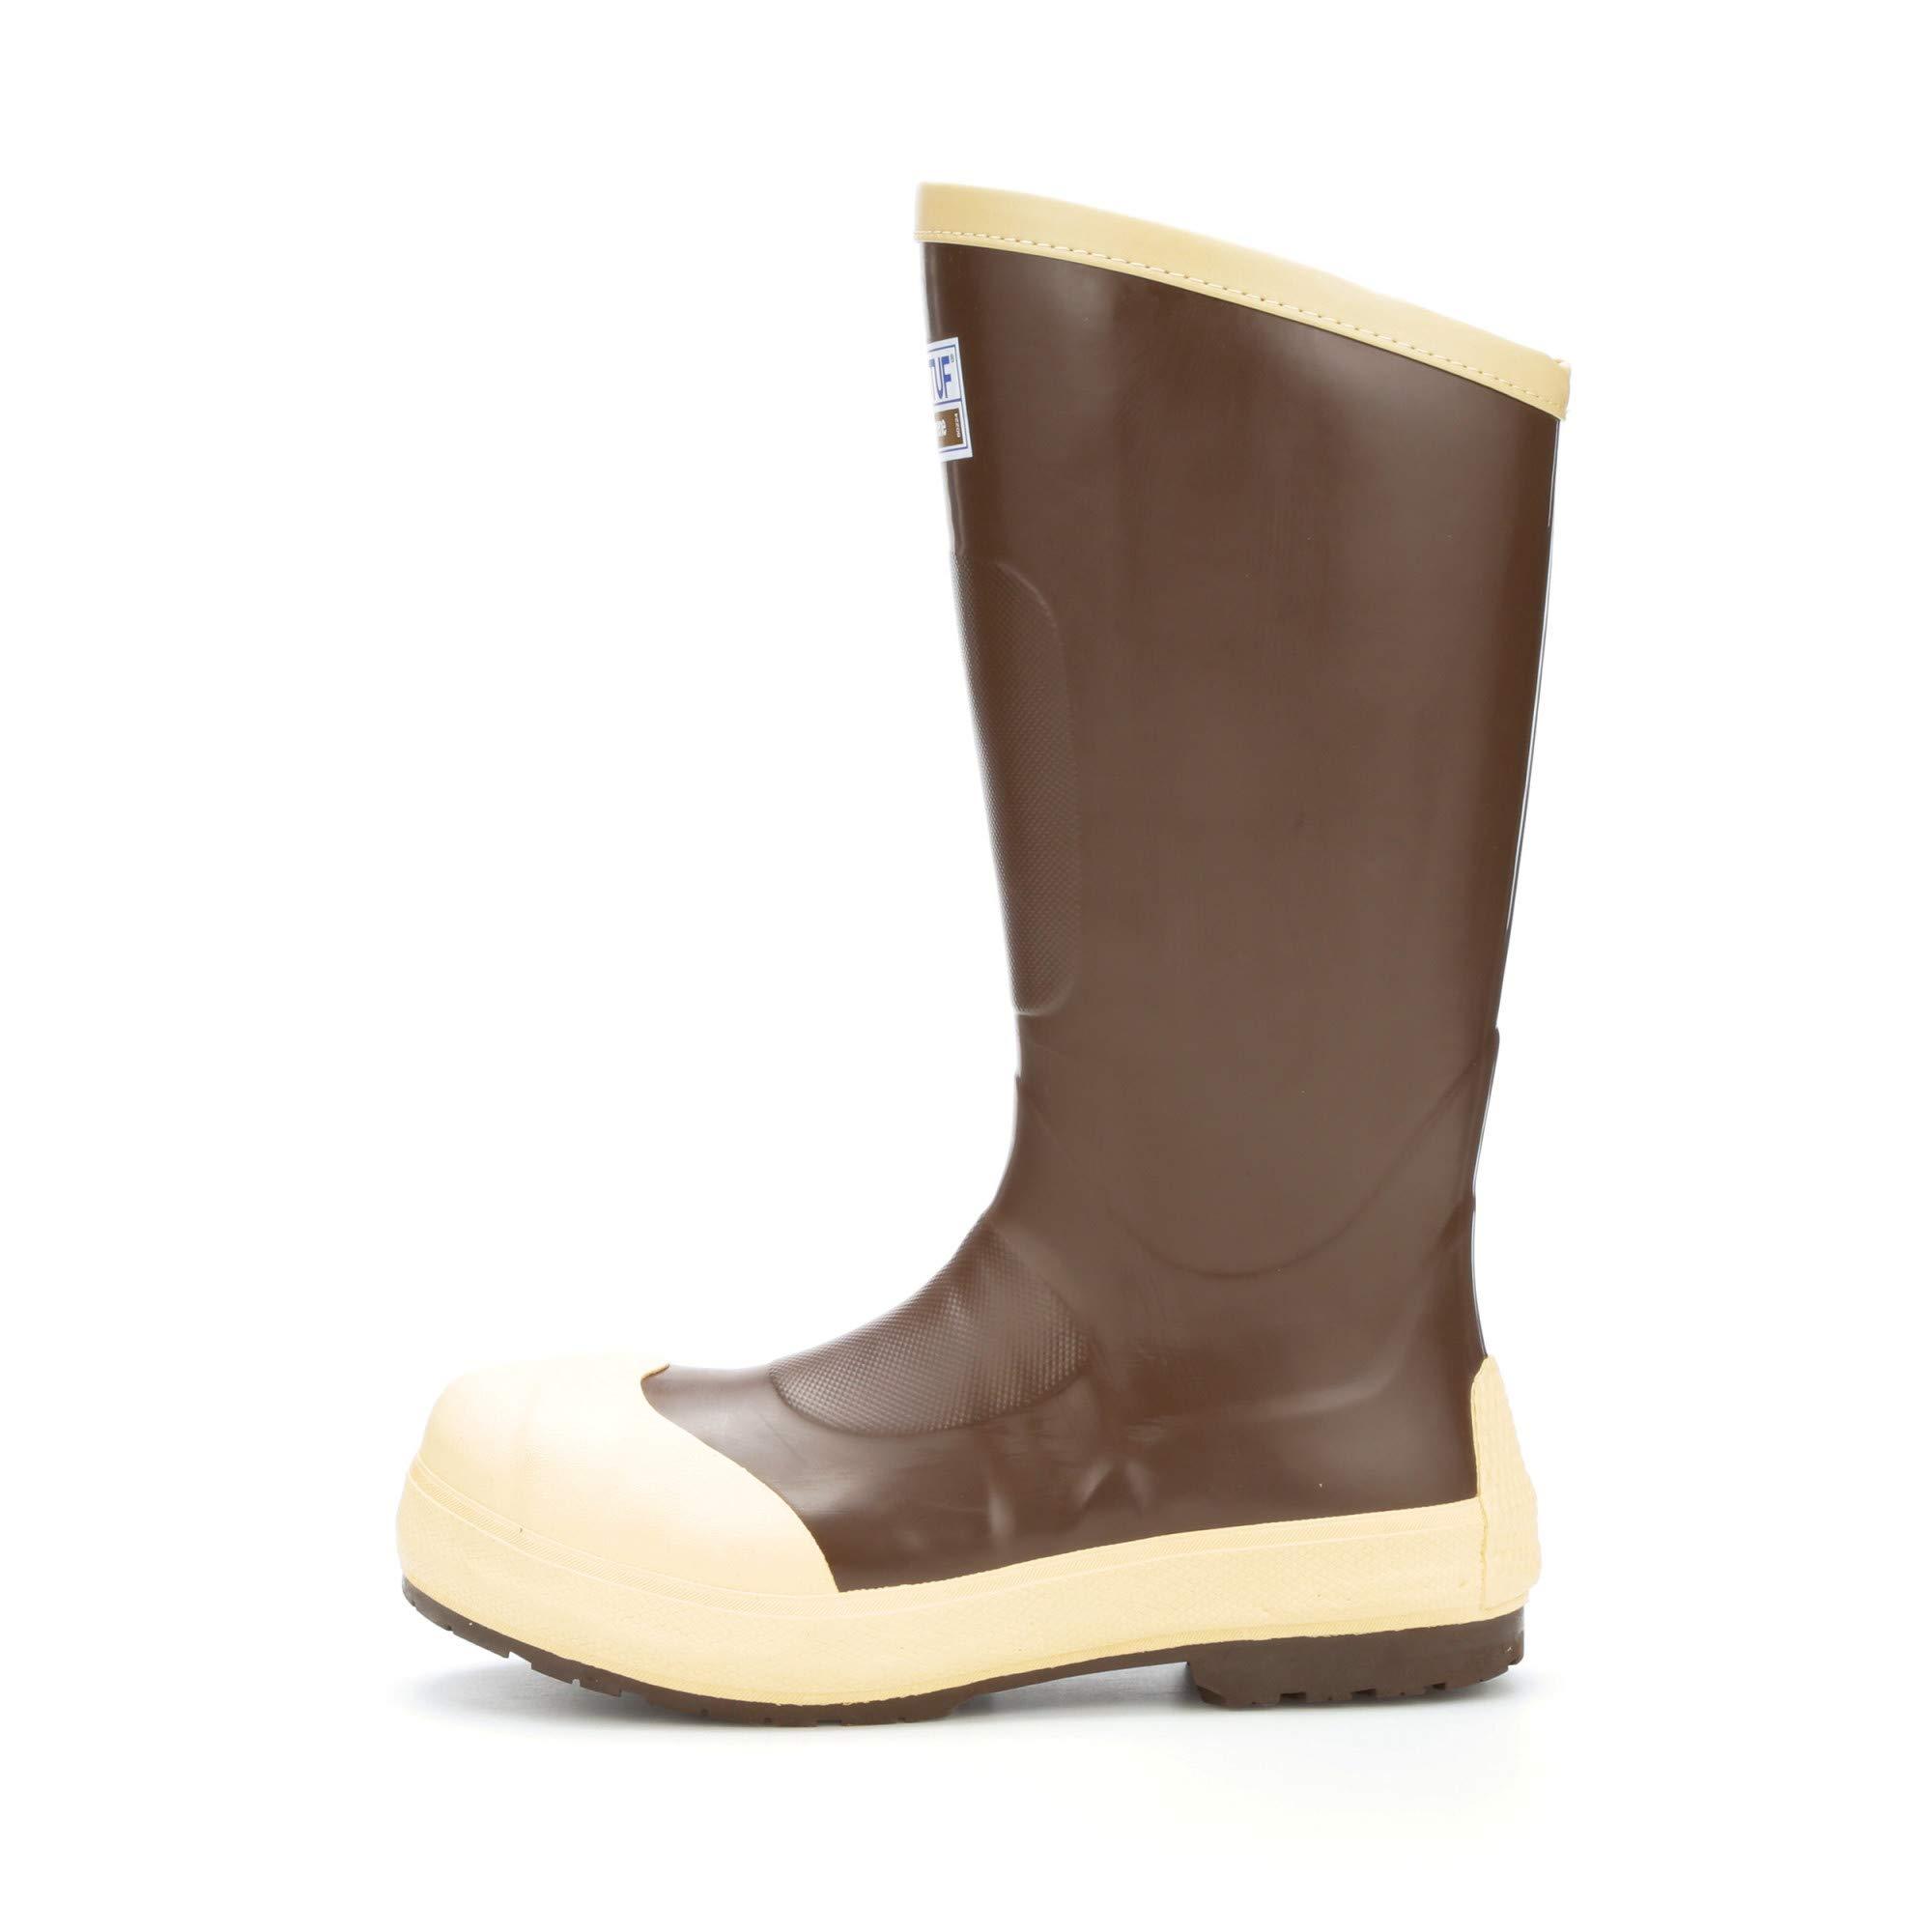 XTRATUF Legacy 2.0 Series 15'' Neoprene Composite Toe Men's Fishing Boots, Copper & Tan (22292G) by Xtratuf (Image #7)